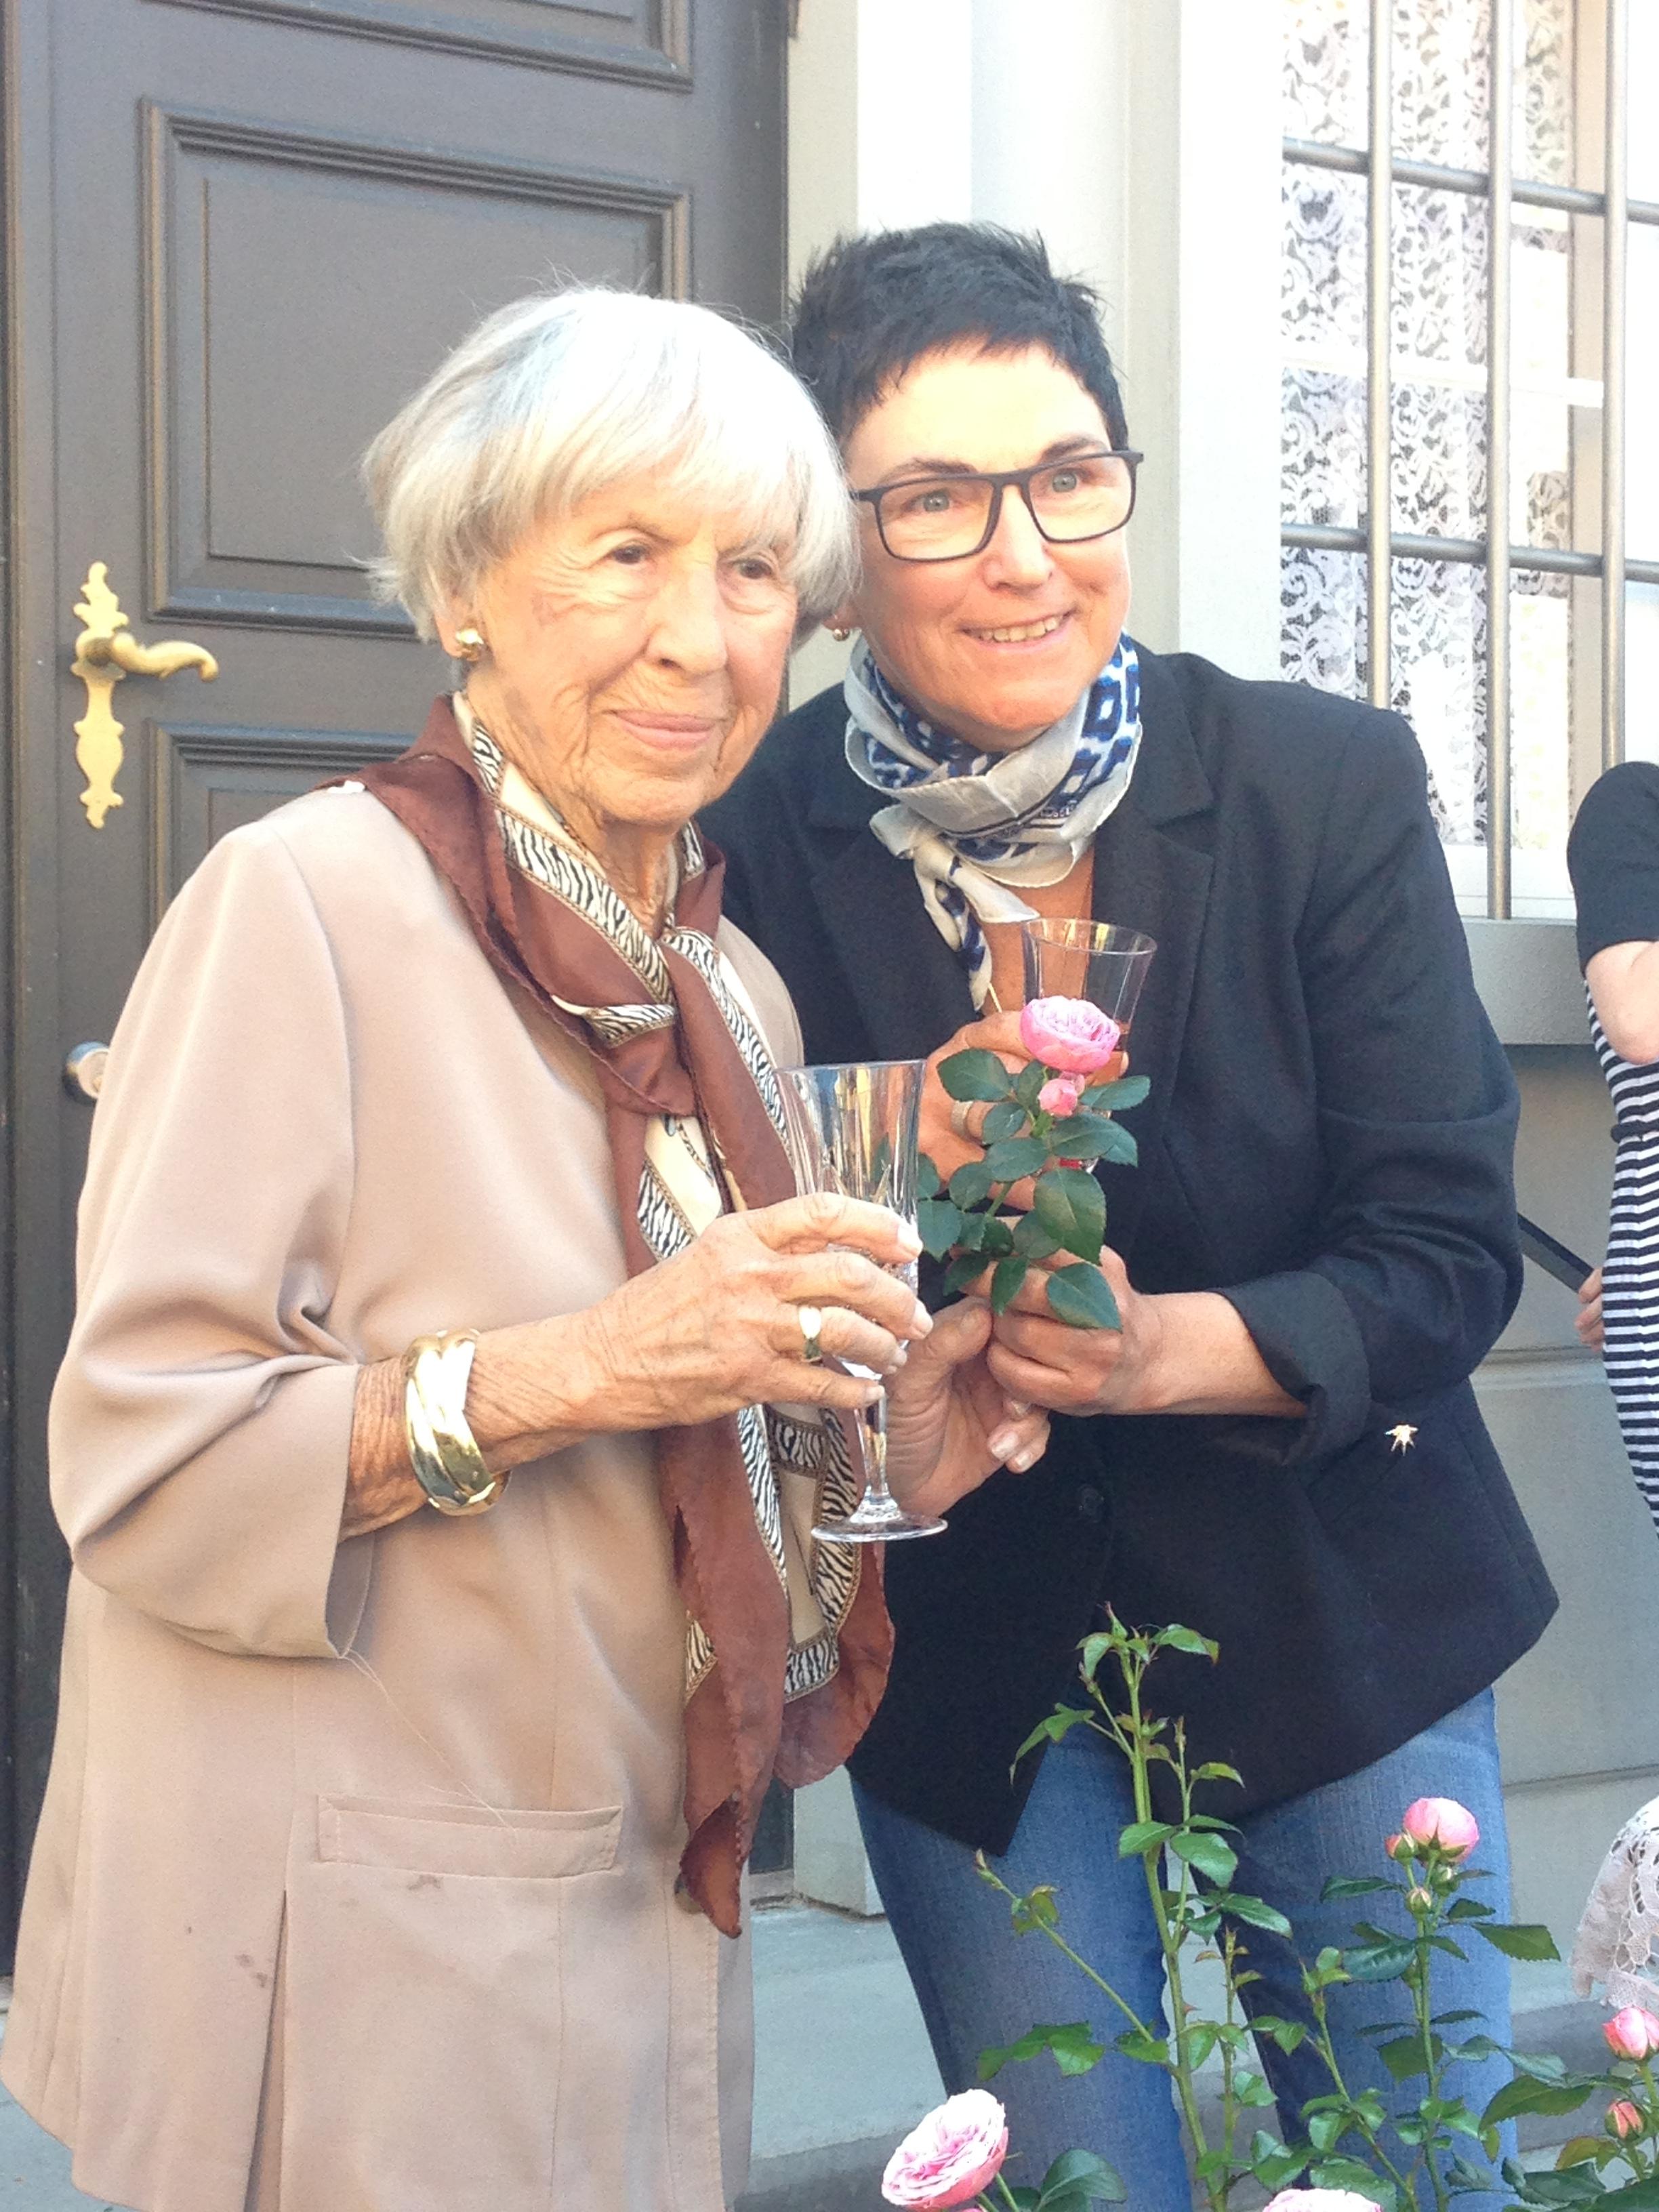 Lise Nørgaard and Rosa Eskelund